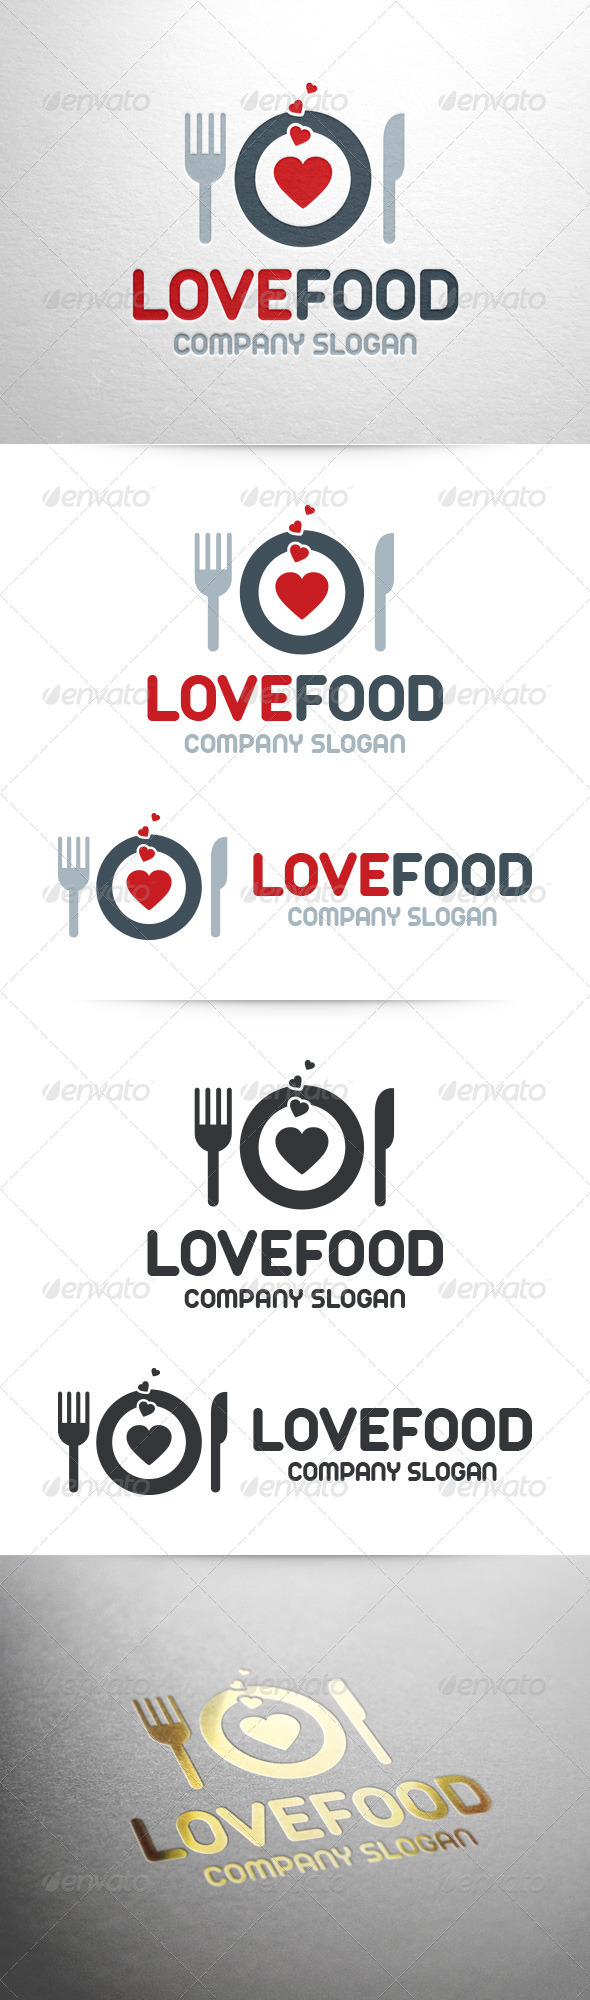 Love Food Logo Template - Food Logo Templates